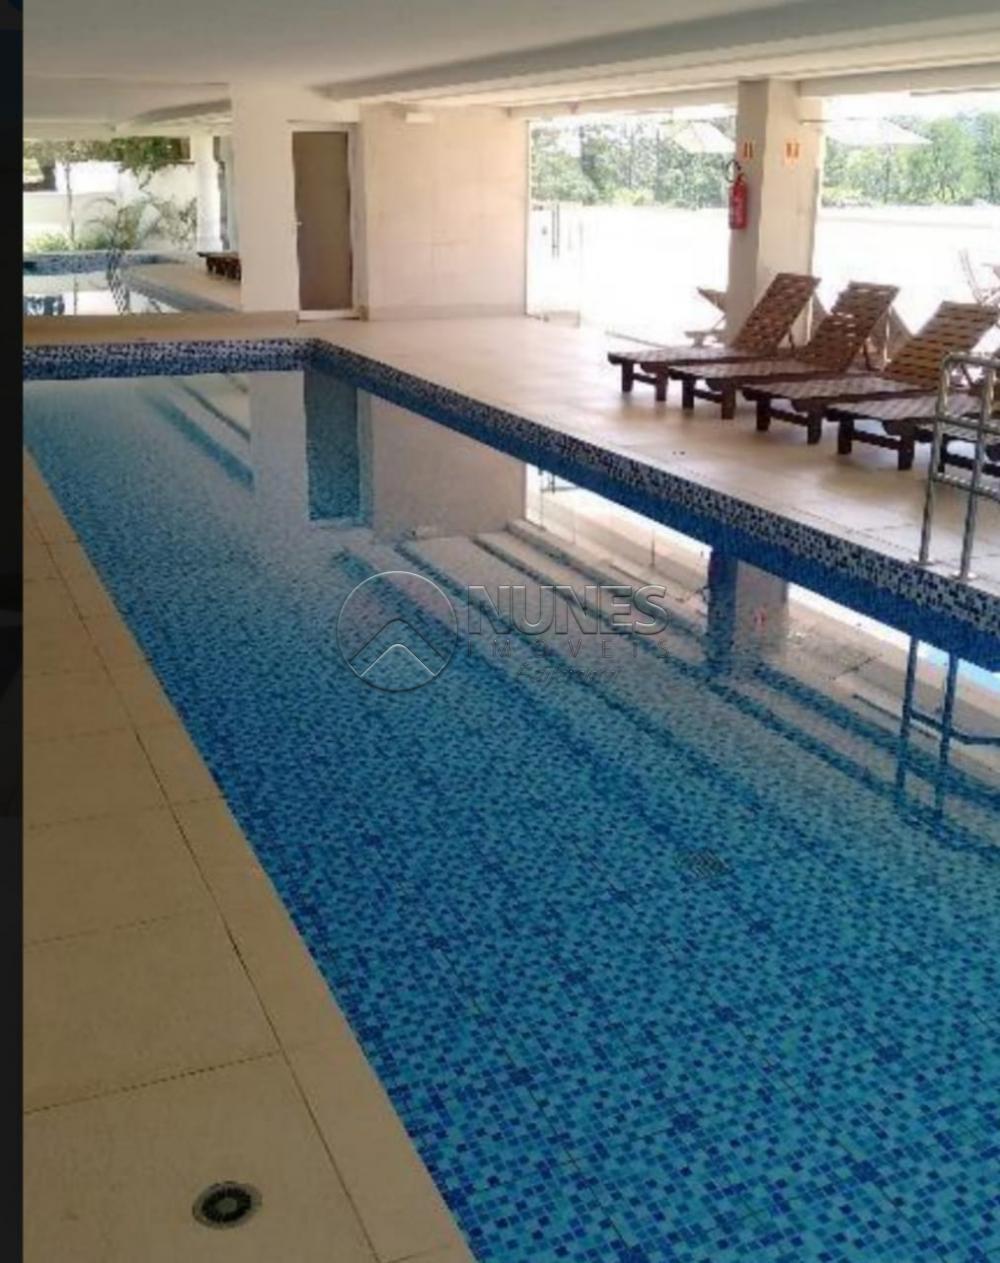 Comprar Apartamento / Flat em Cotia R$ 300.000,00 - Foto 18